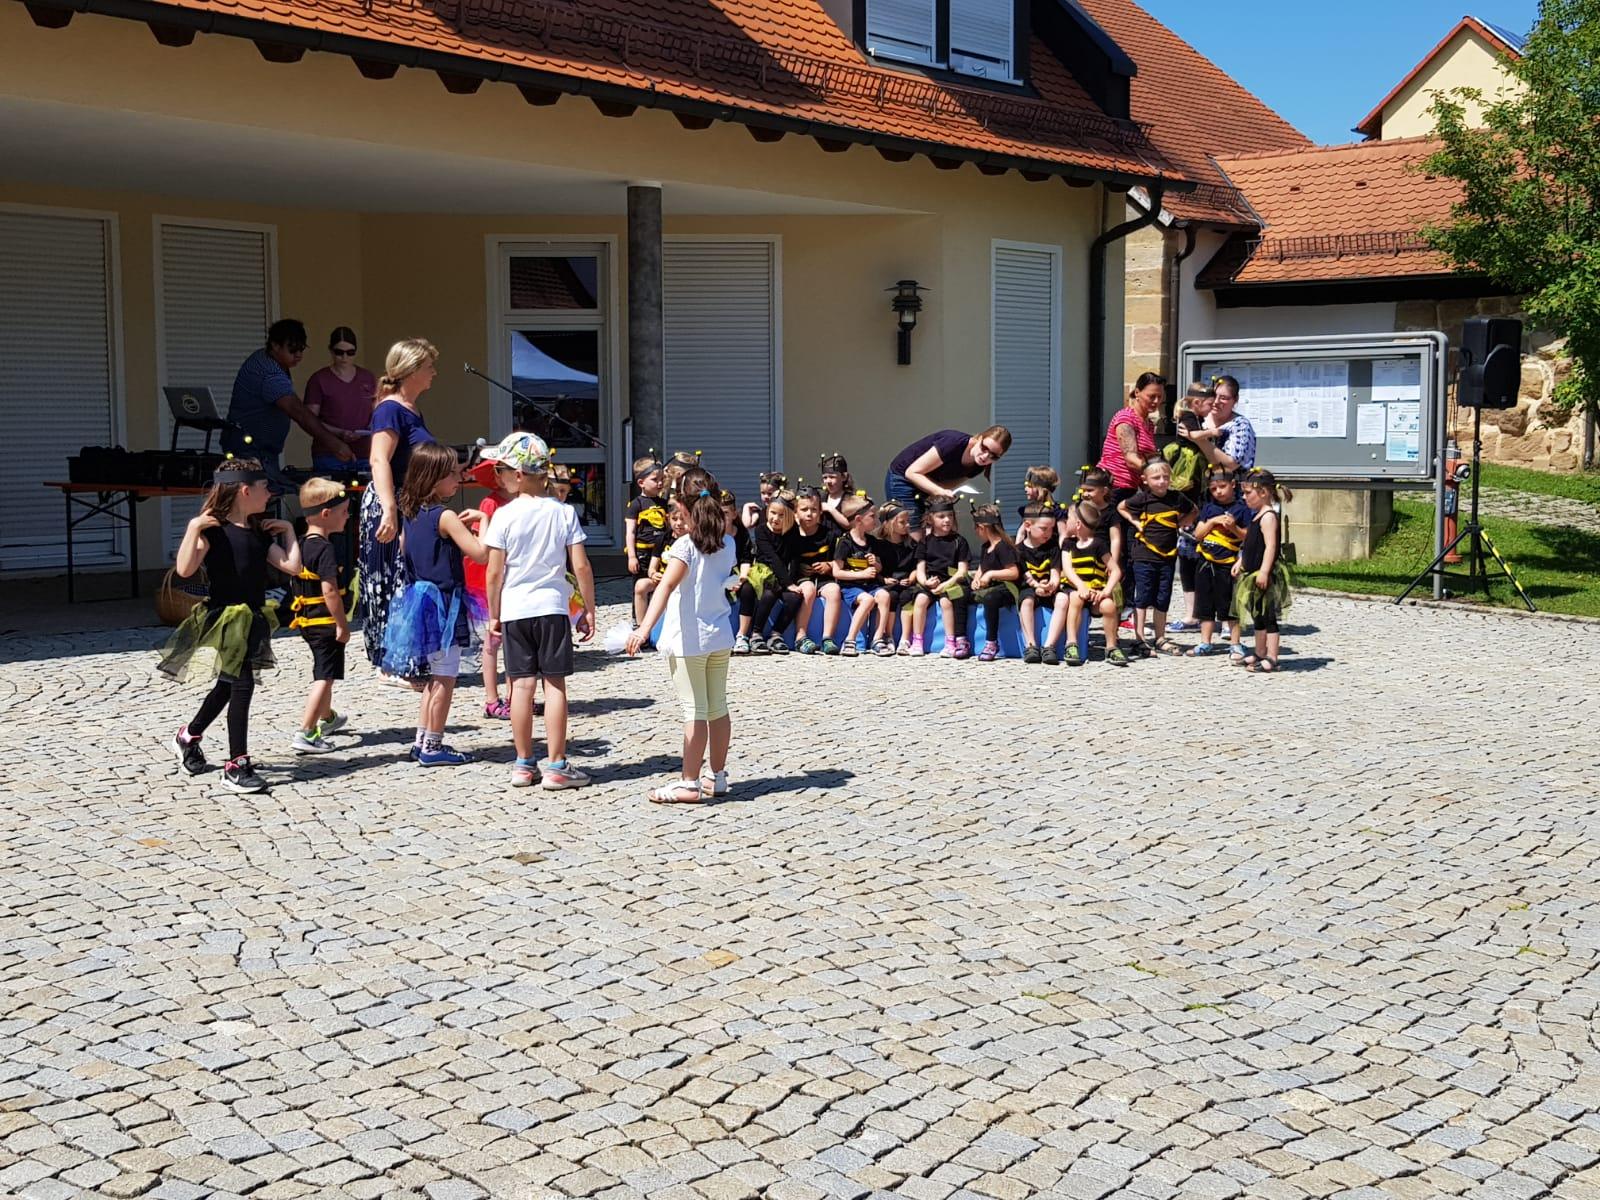 Sommerfest auf Rathausplatz